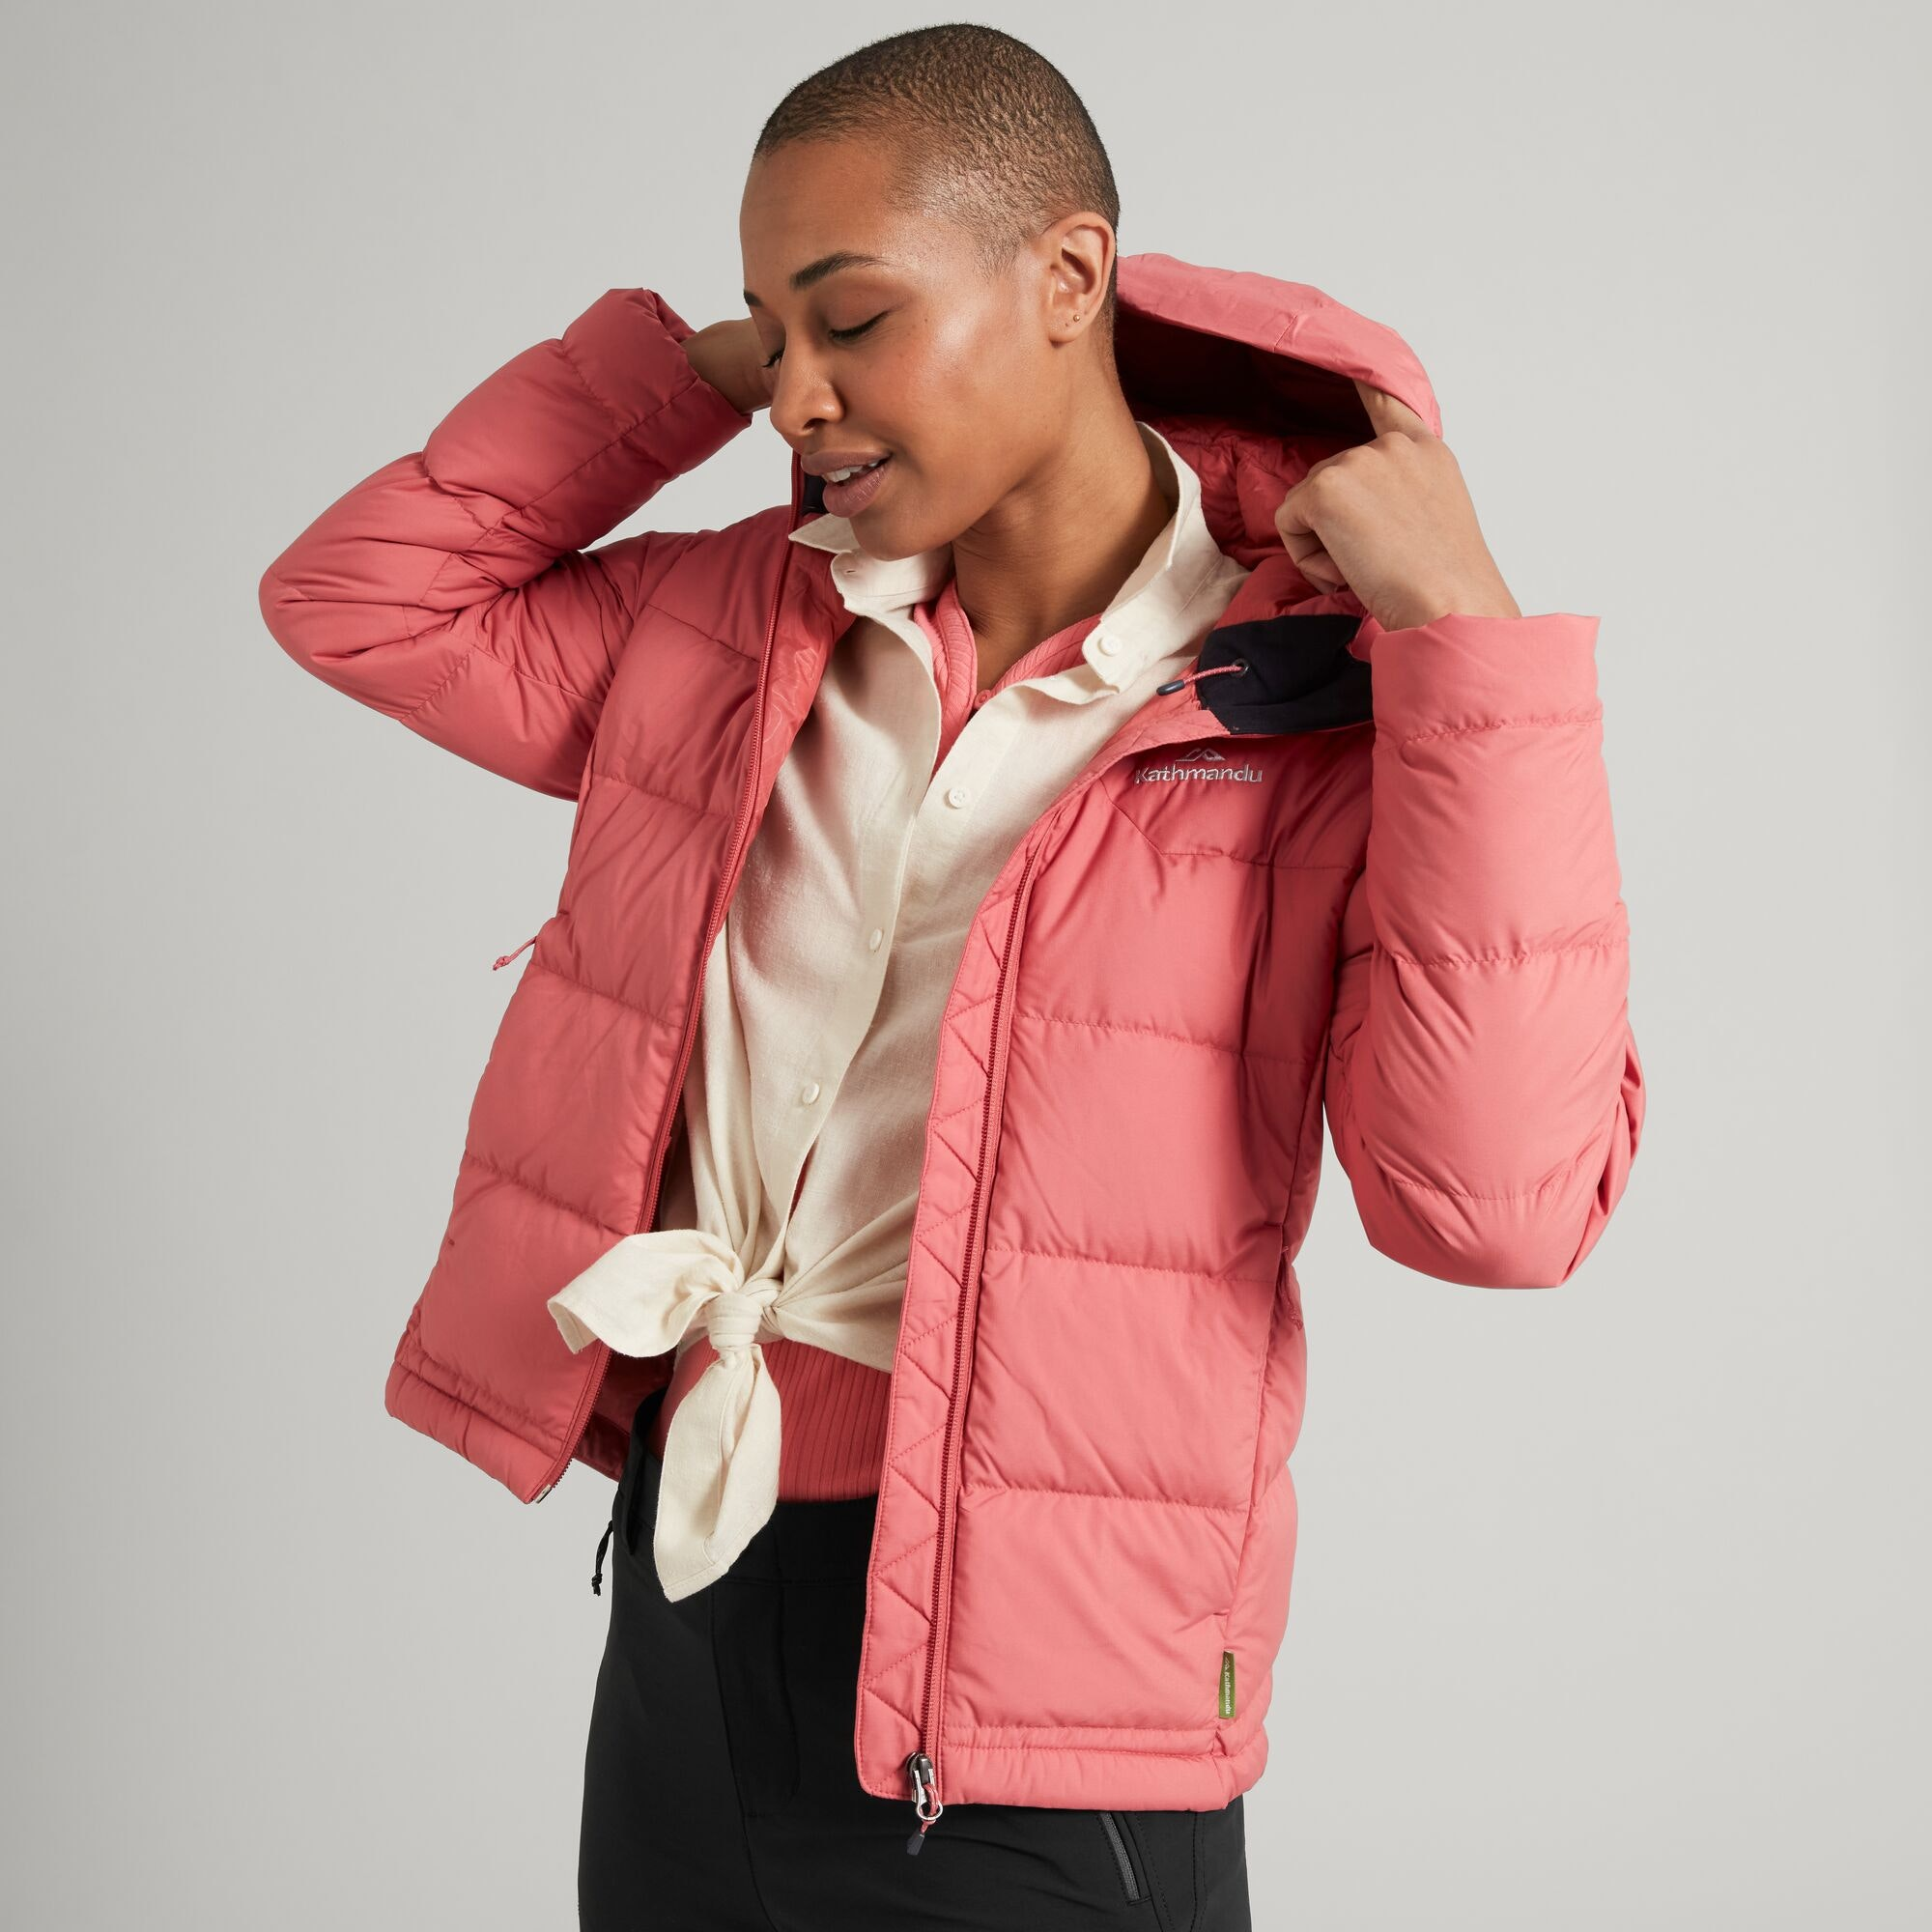 thumbnail 29 - NEW Kathmandu Epiq Womens Hooded Down Puffer 600 Fill Warm Outdoor Winter Jacket